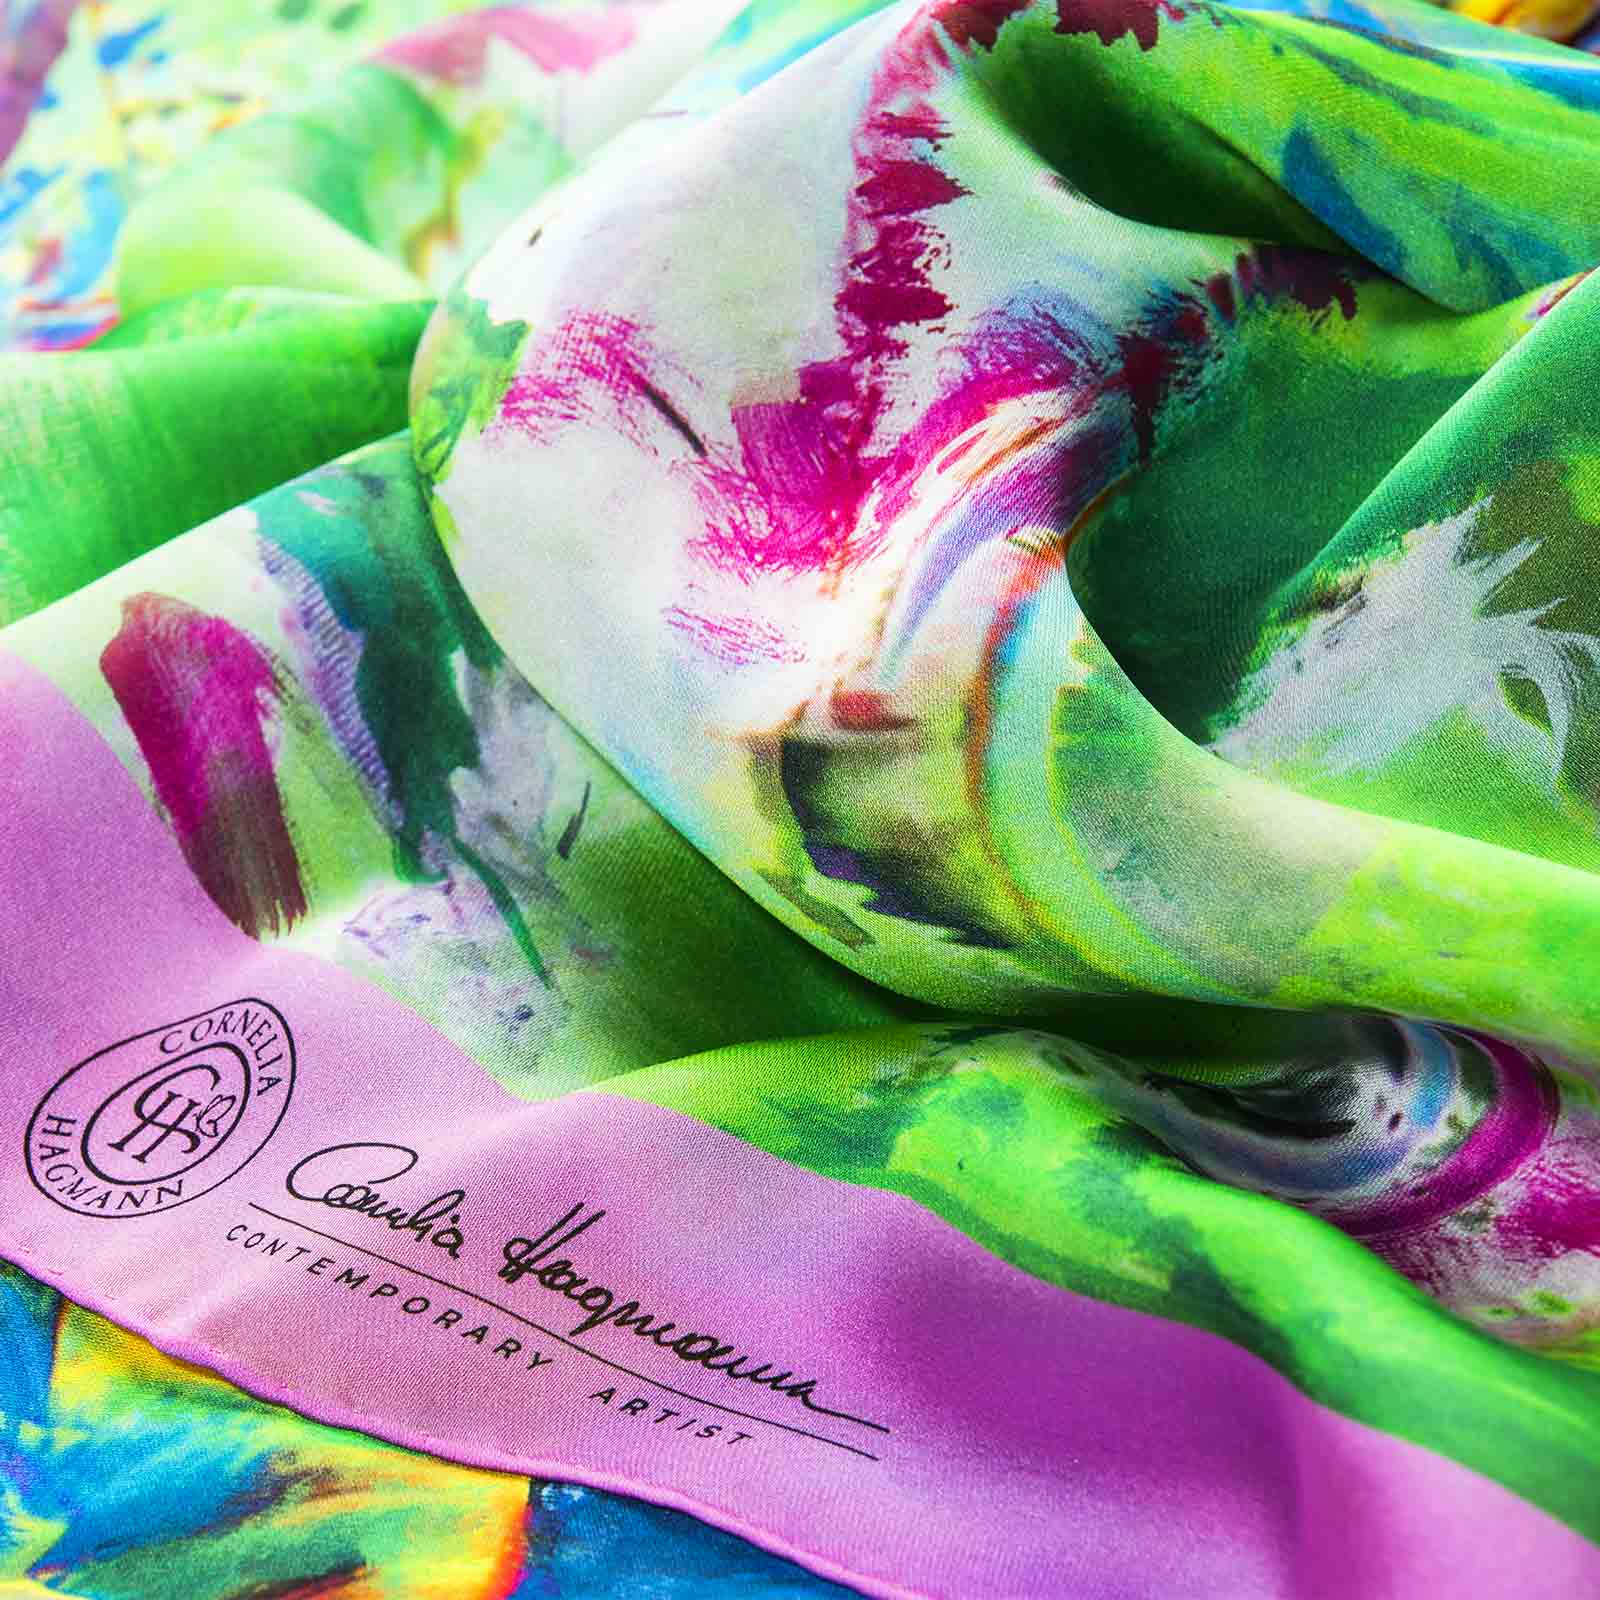 Cornelia Hagmann Contemporary Artist La Galleria Silk Scarf The Majesty of Colours Pink, Seidenschal, sciarpa di seta, foulard soie,